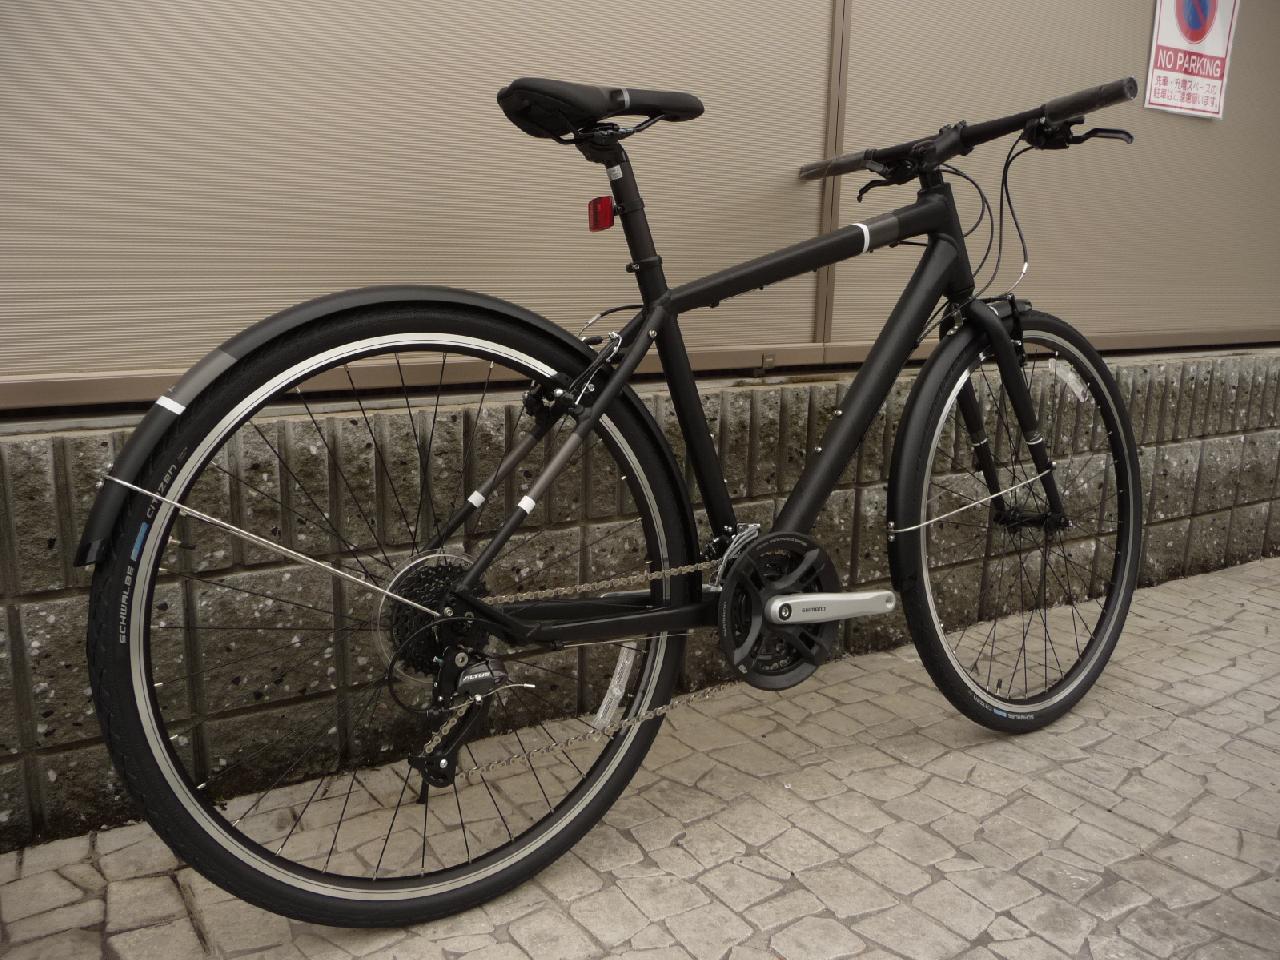 SPEED 40 【MATT BLACK】特価クロス ... : スコット 自転車 クロス : 自転車の